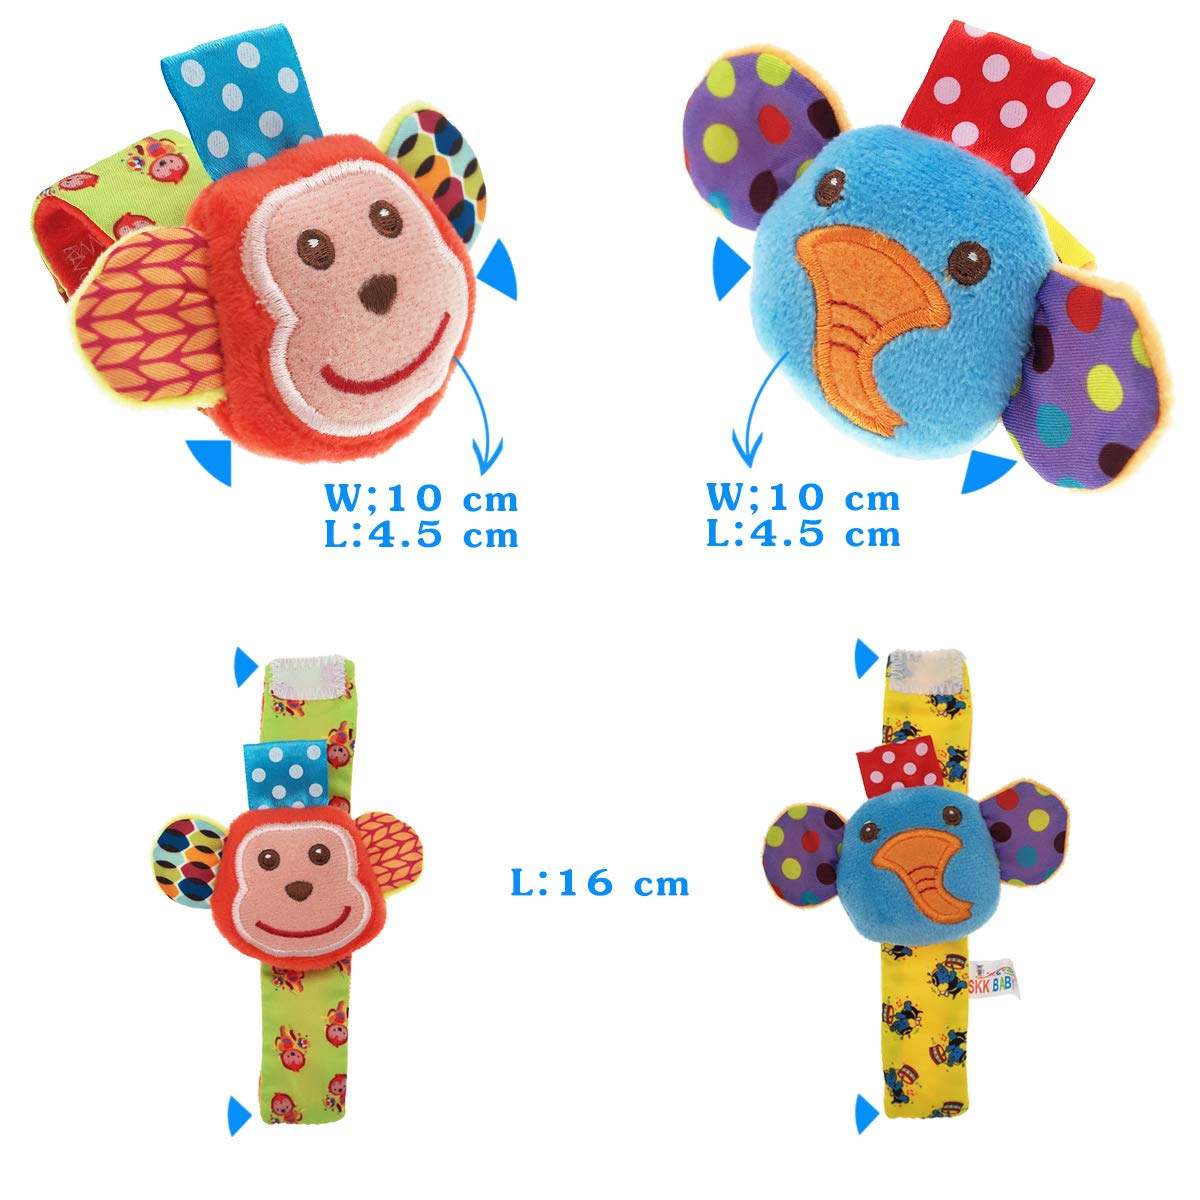 URUTOREO Baby Rattle Developmental Soft Animal Rattles Monkey and Elephant Socks Toys Infant Baby Toys Baby Wrist Rattle and Foot Rattles Finder Socks Set 4 Pcs